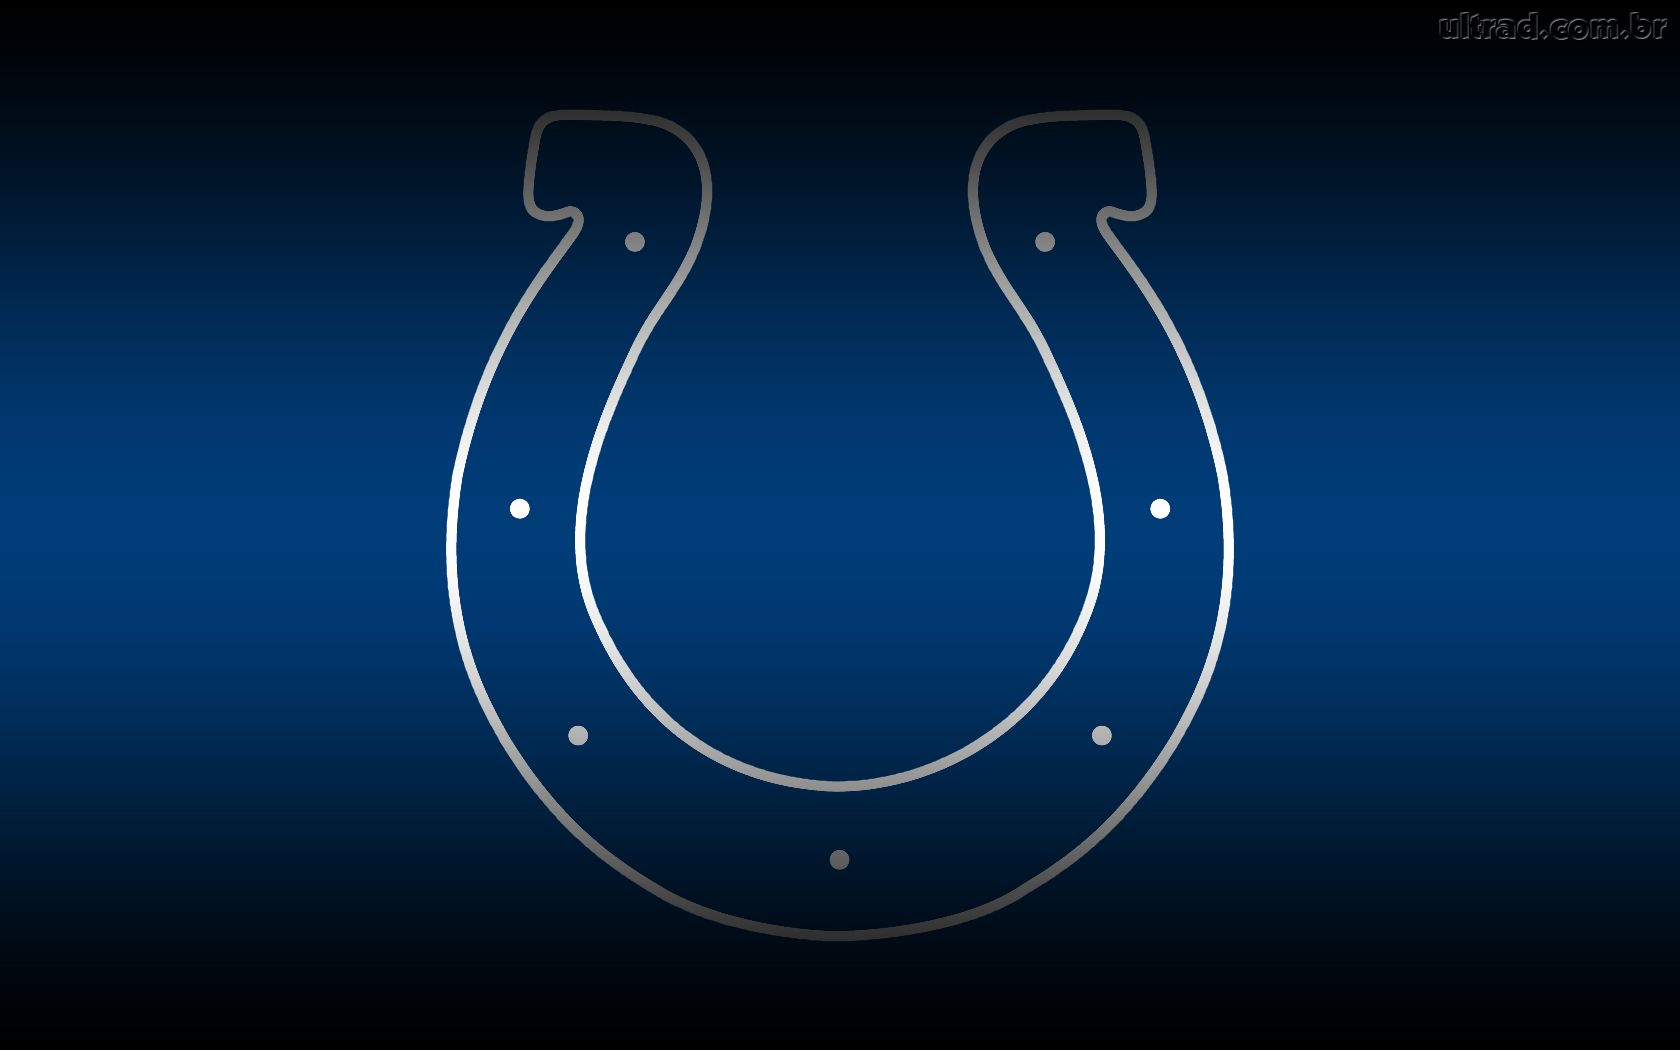 Indianapolis Colts wallpaper 1680x1050